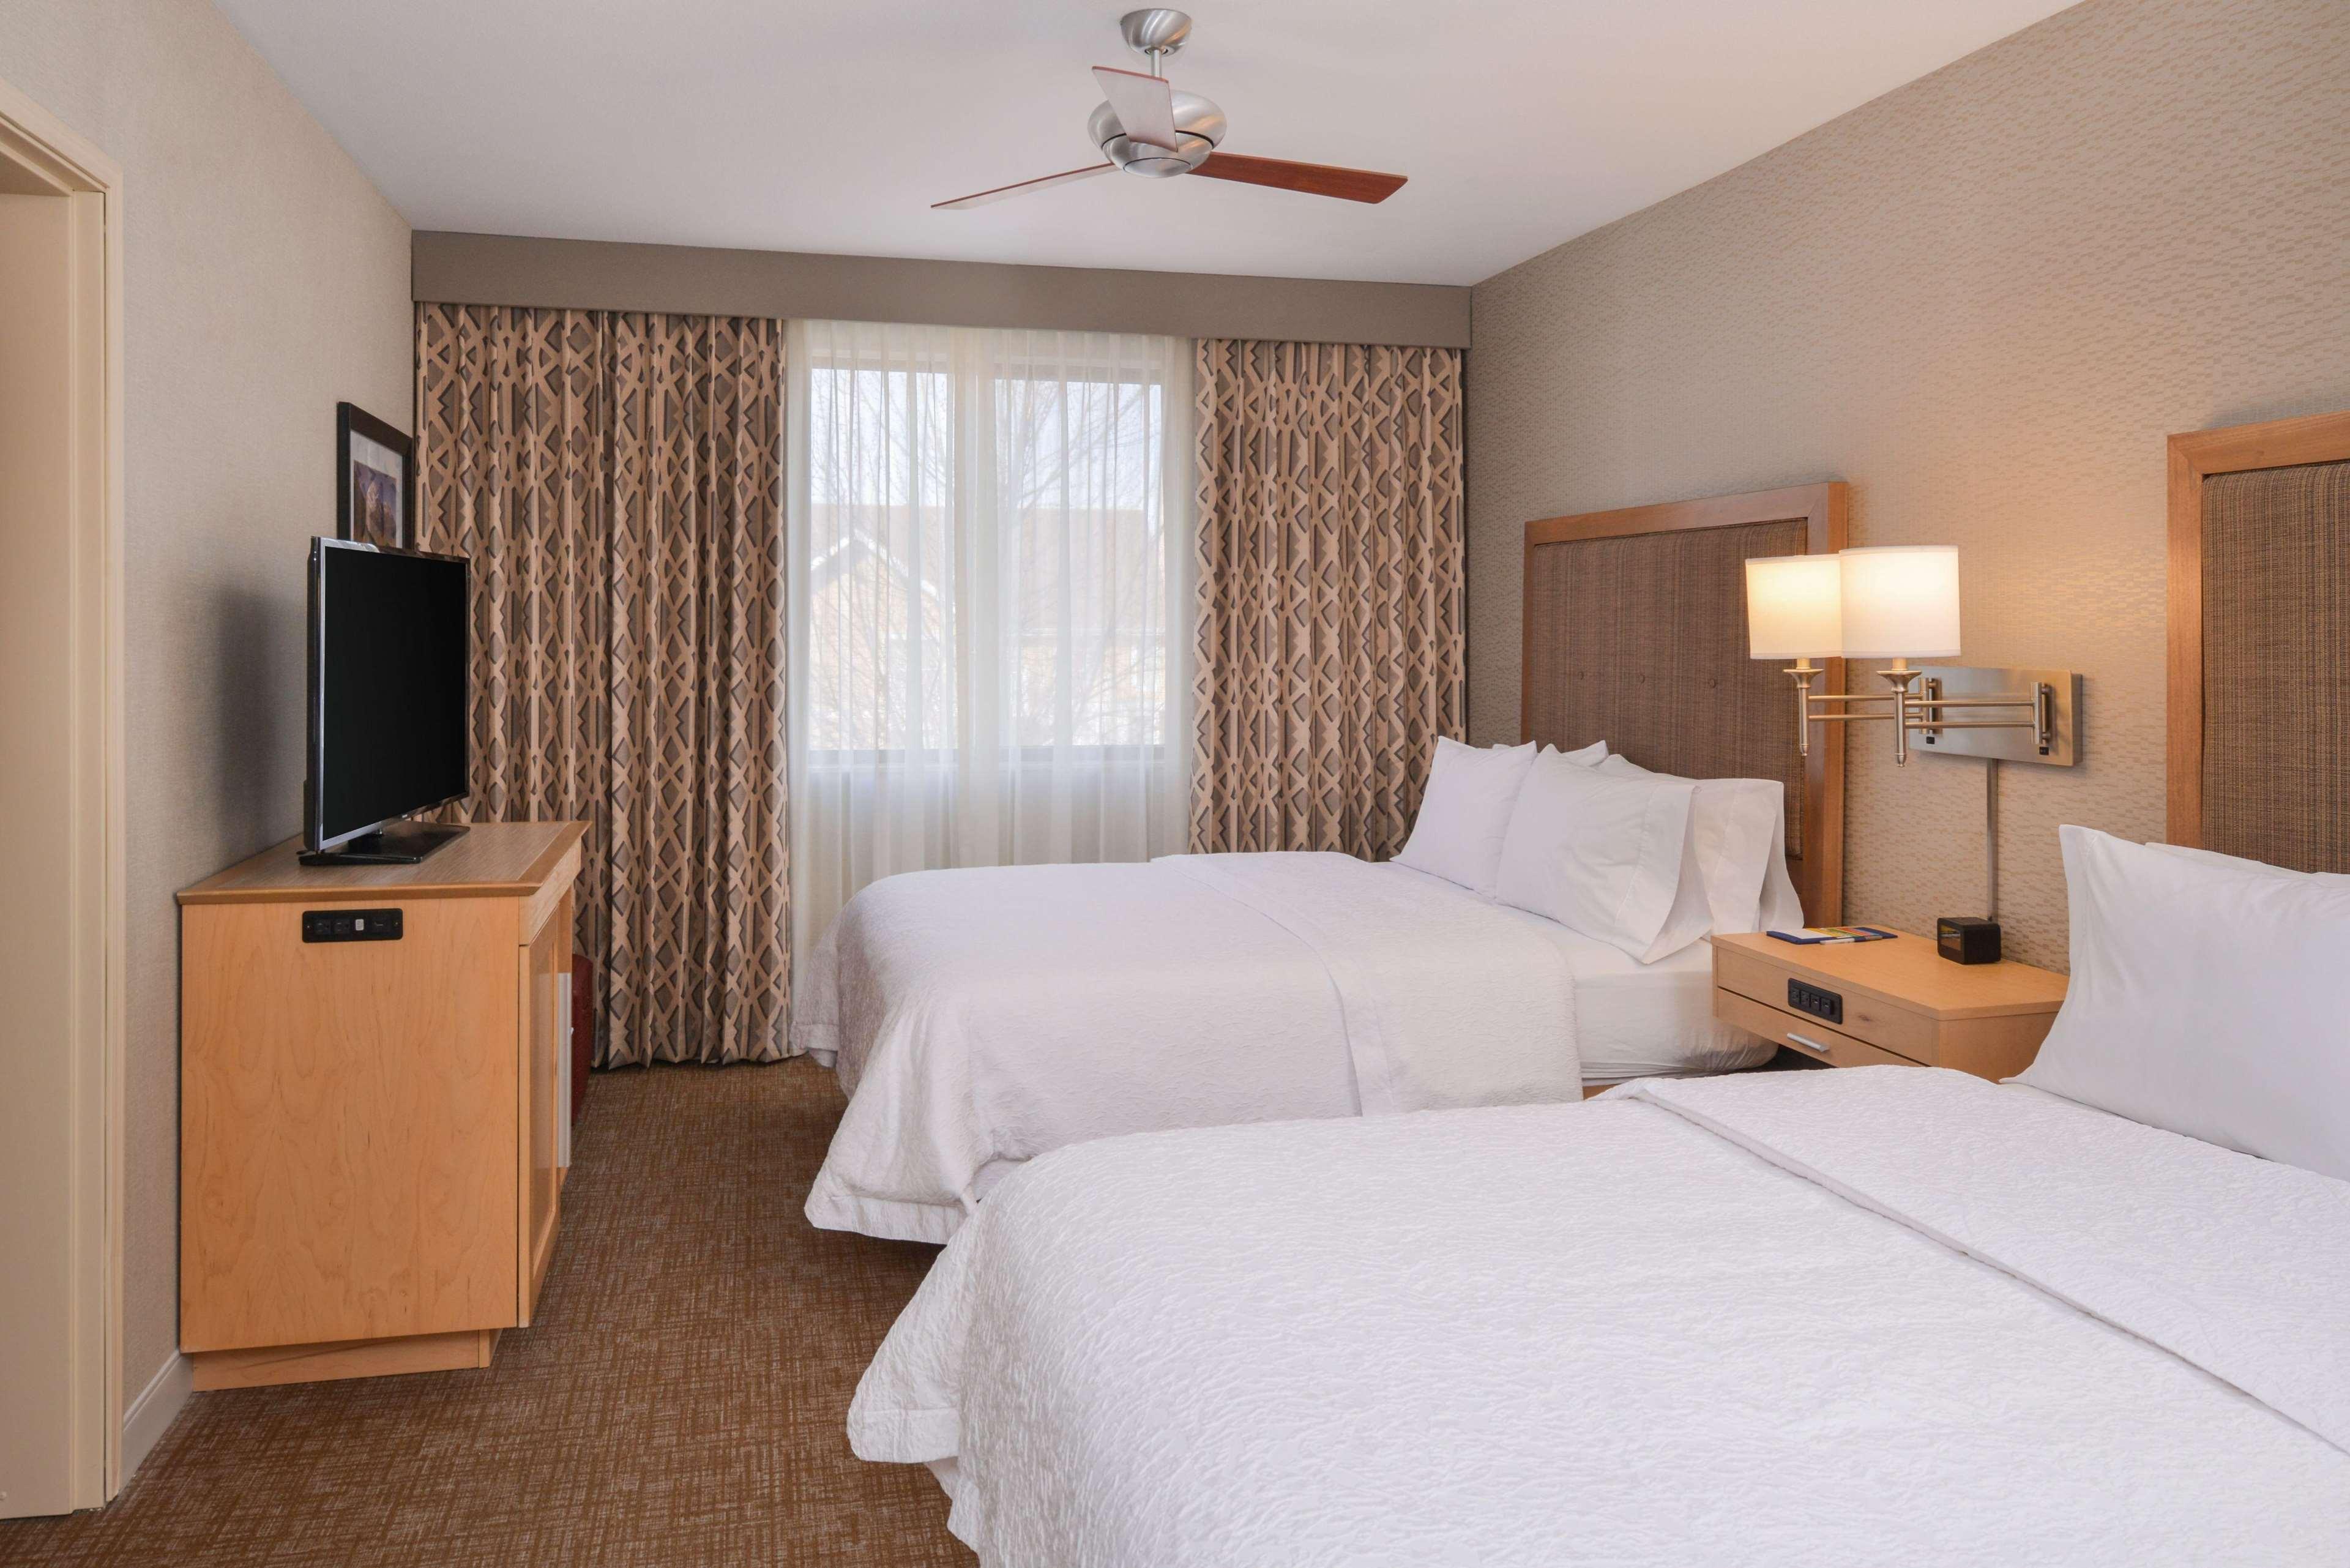 Hampton Inn & Suites Denver-Speer Boulevard image 31